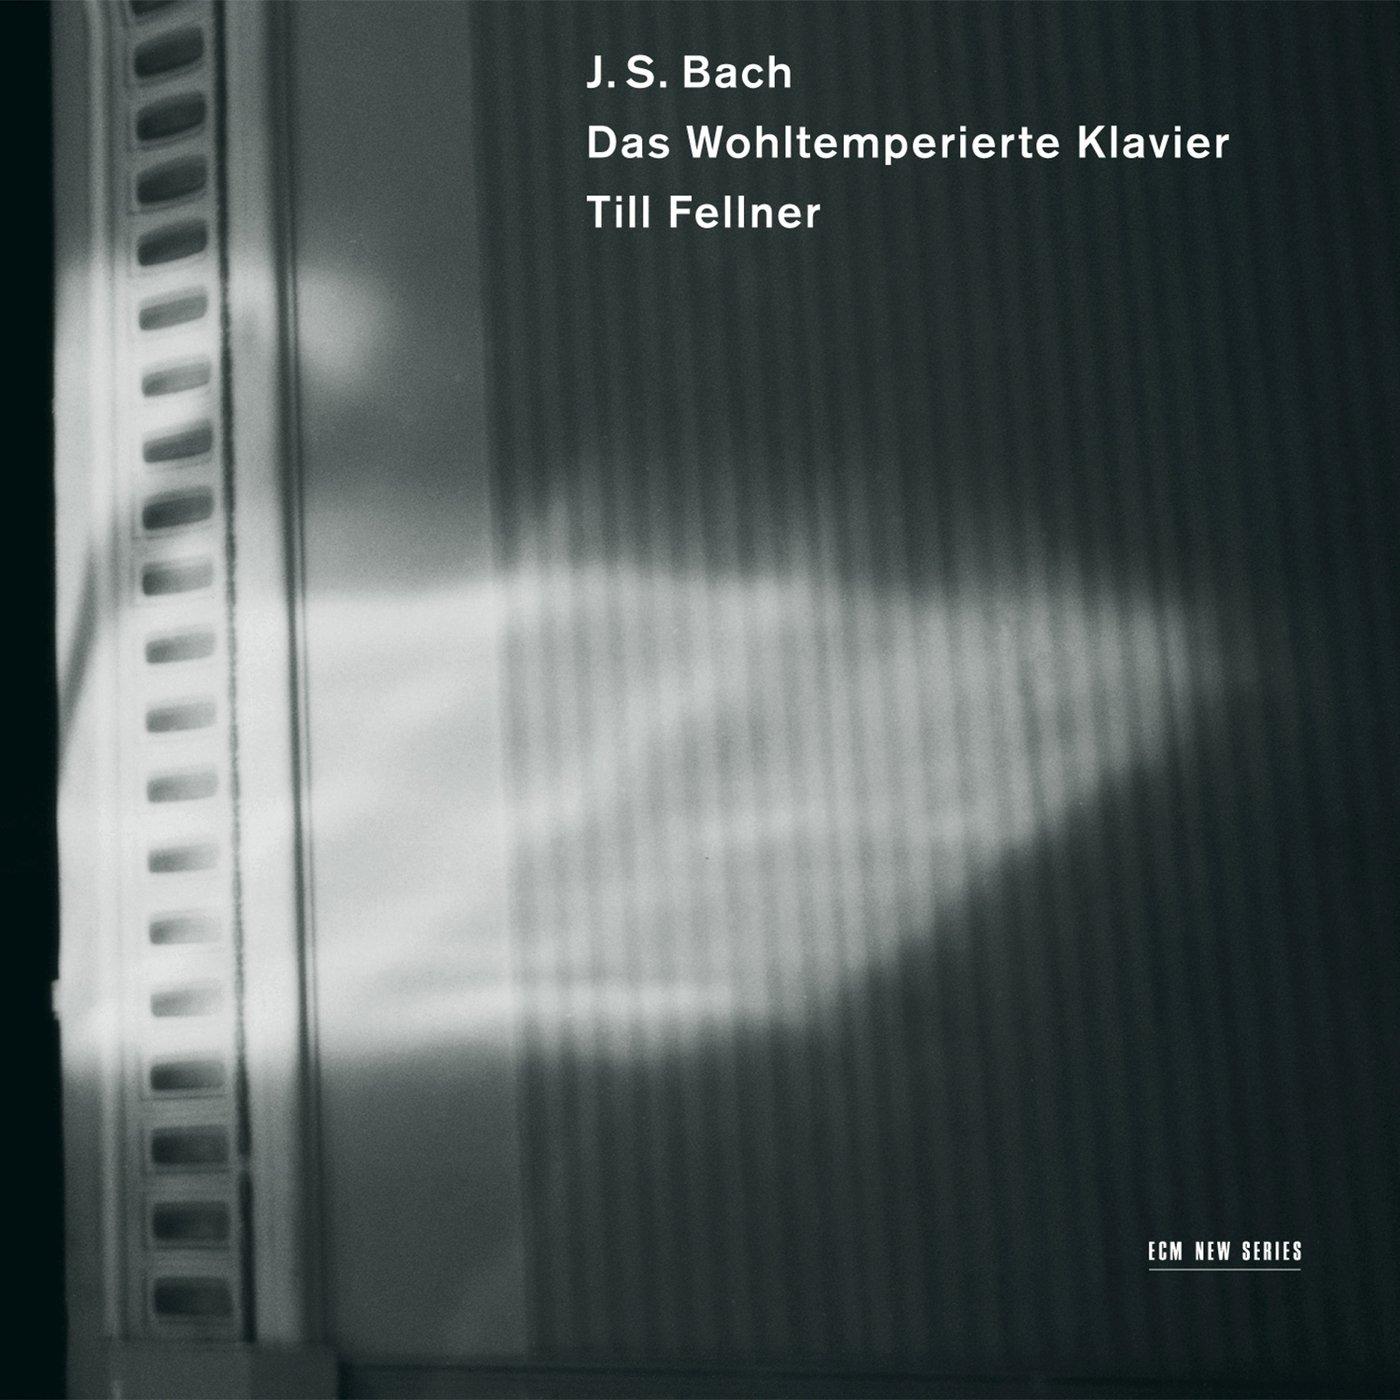 J. S. Bach: Das Wohltemperierte Klavier - Book 1 Fashionable 869 846 BWV Max 43% OFF